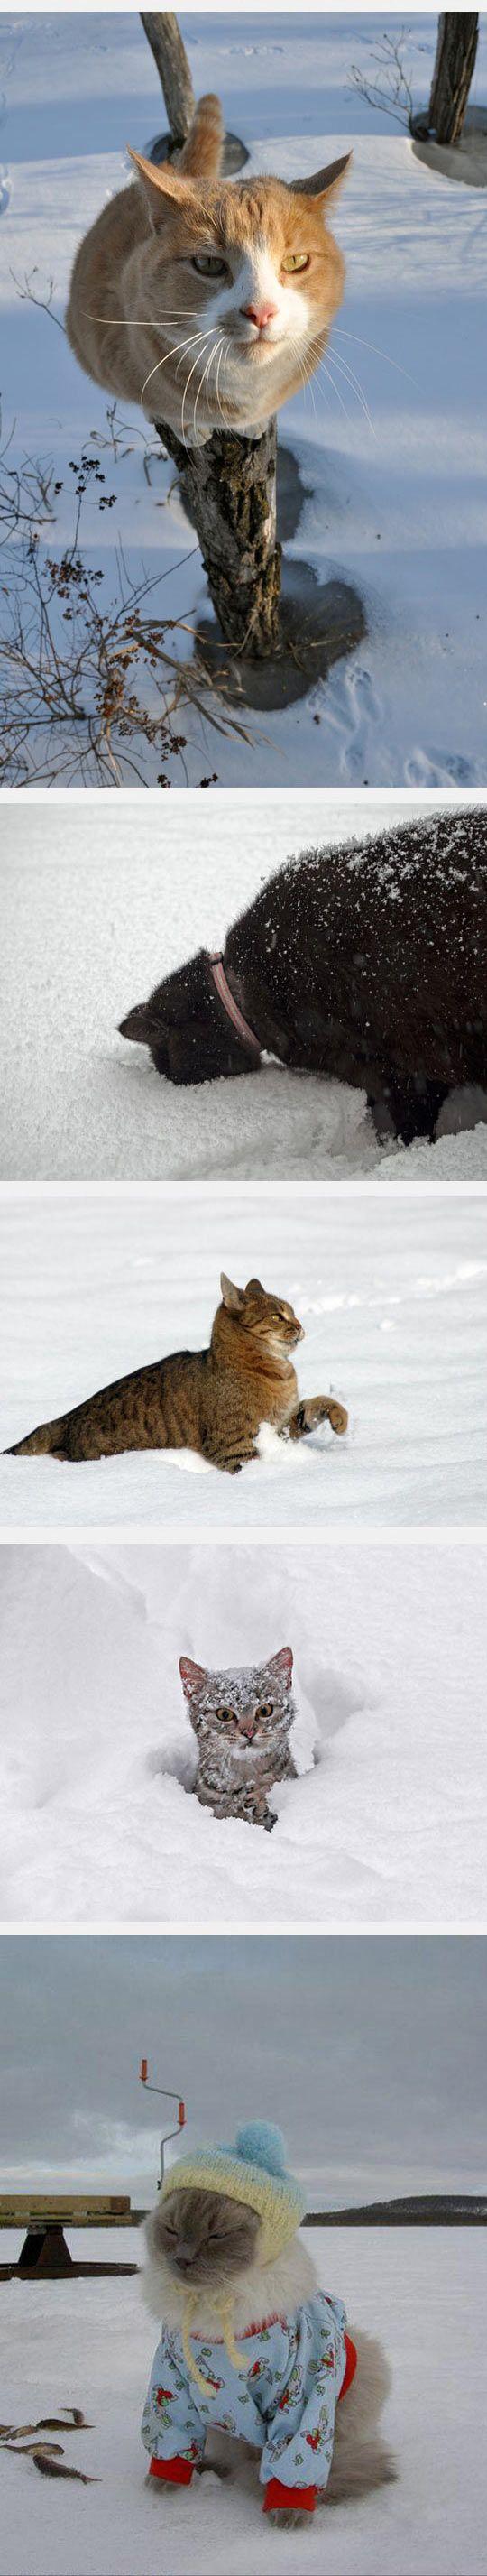 cats enjoying the snow...